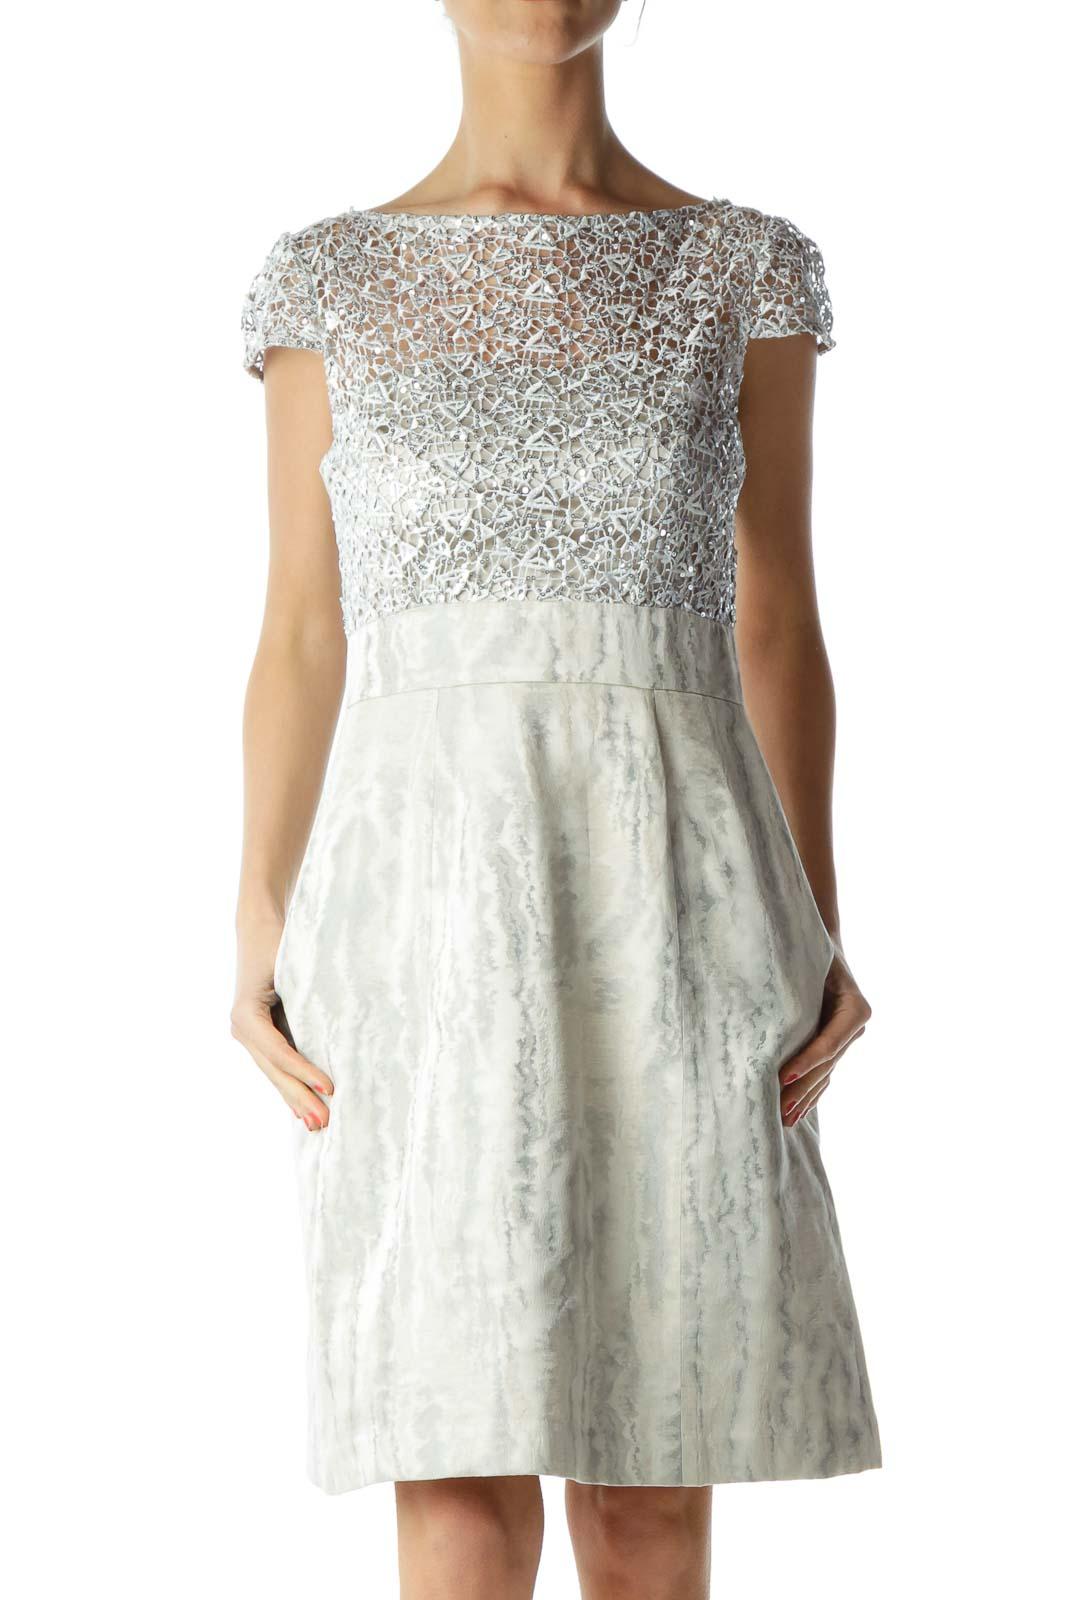 Cream Silver Sequined Metallic Cocktail Dress